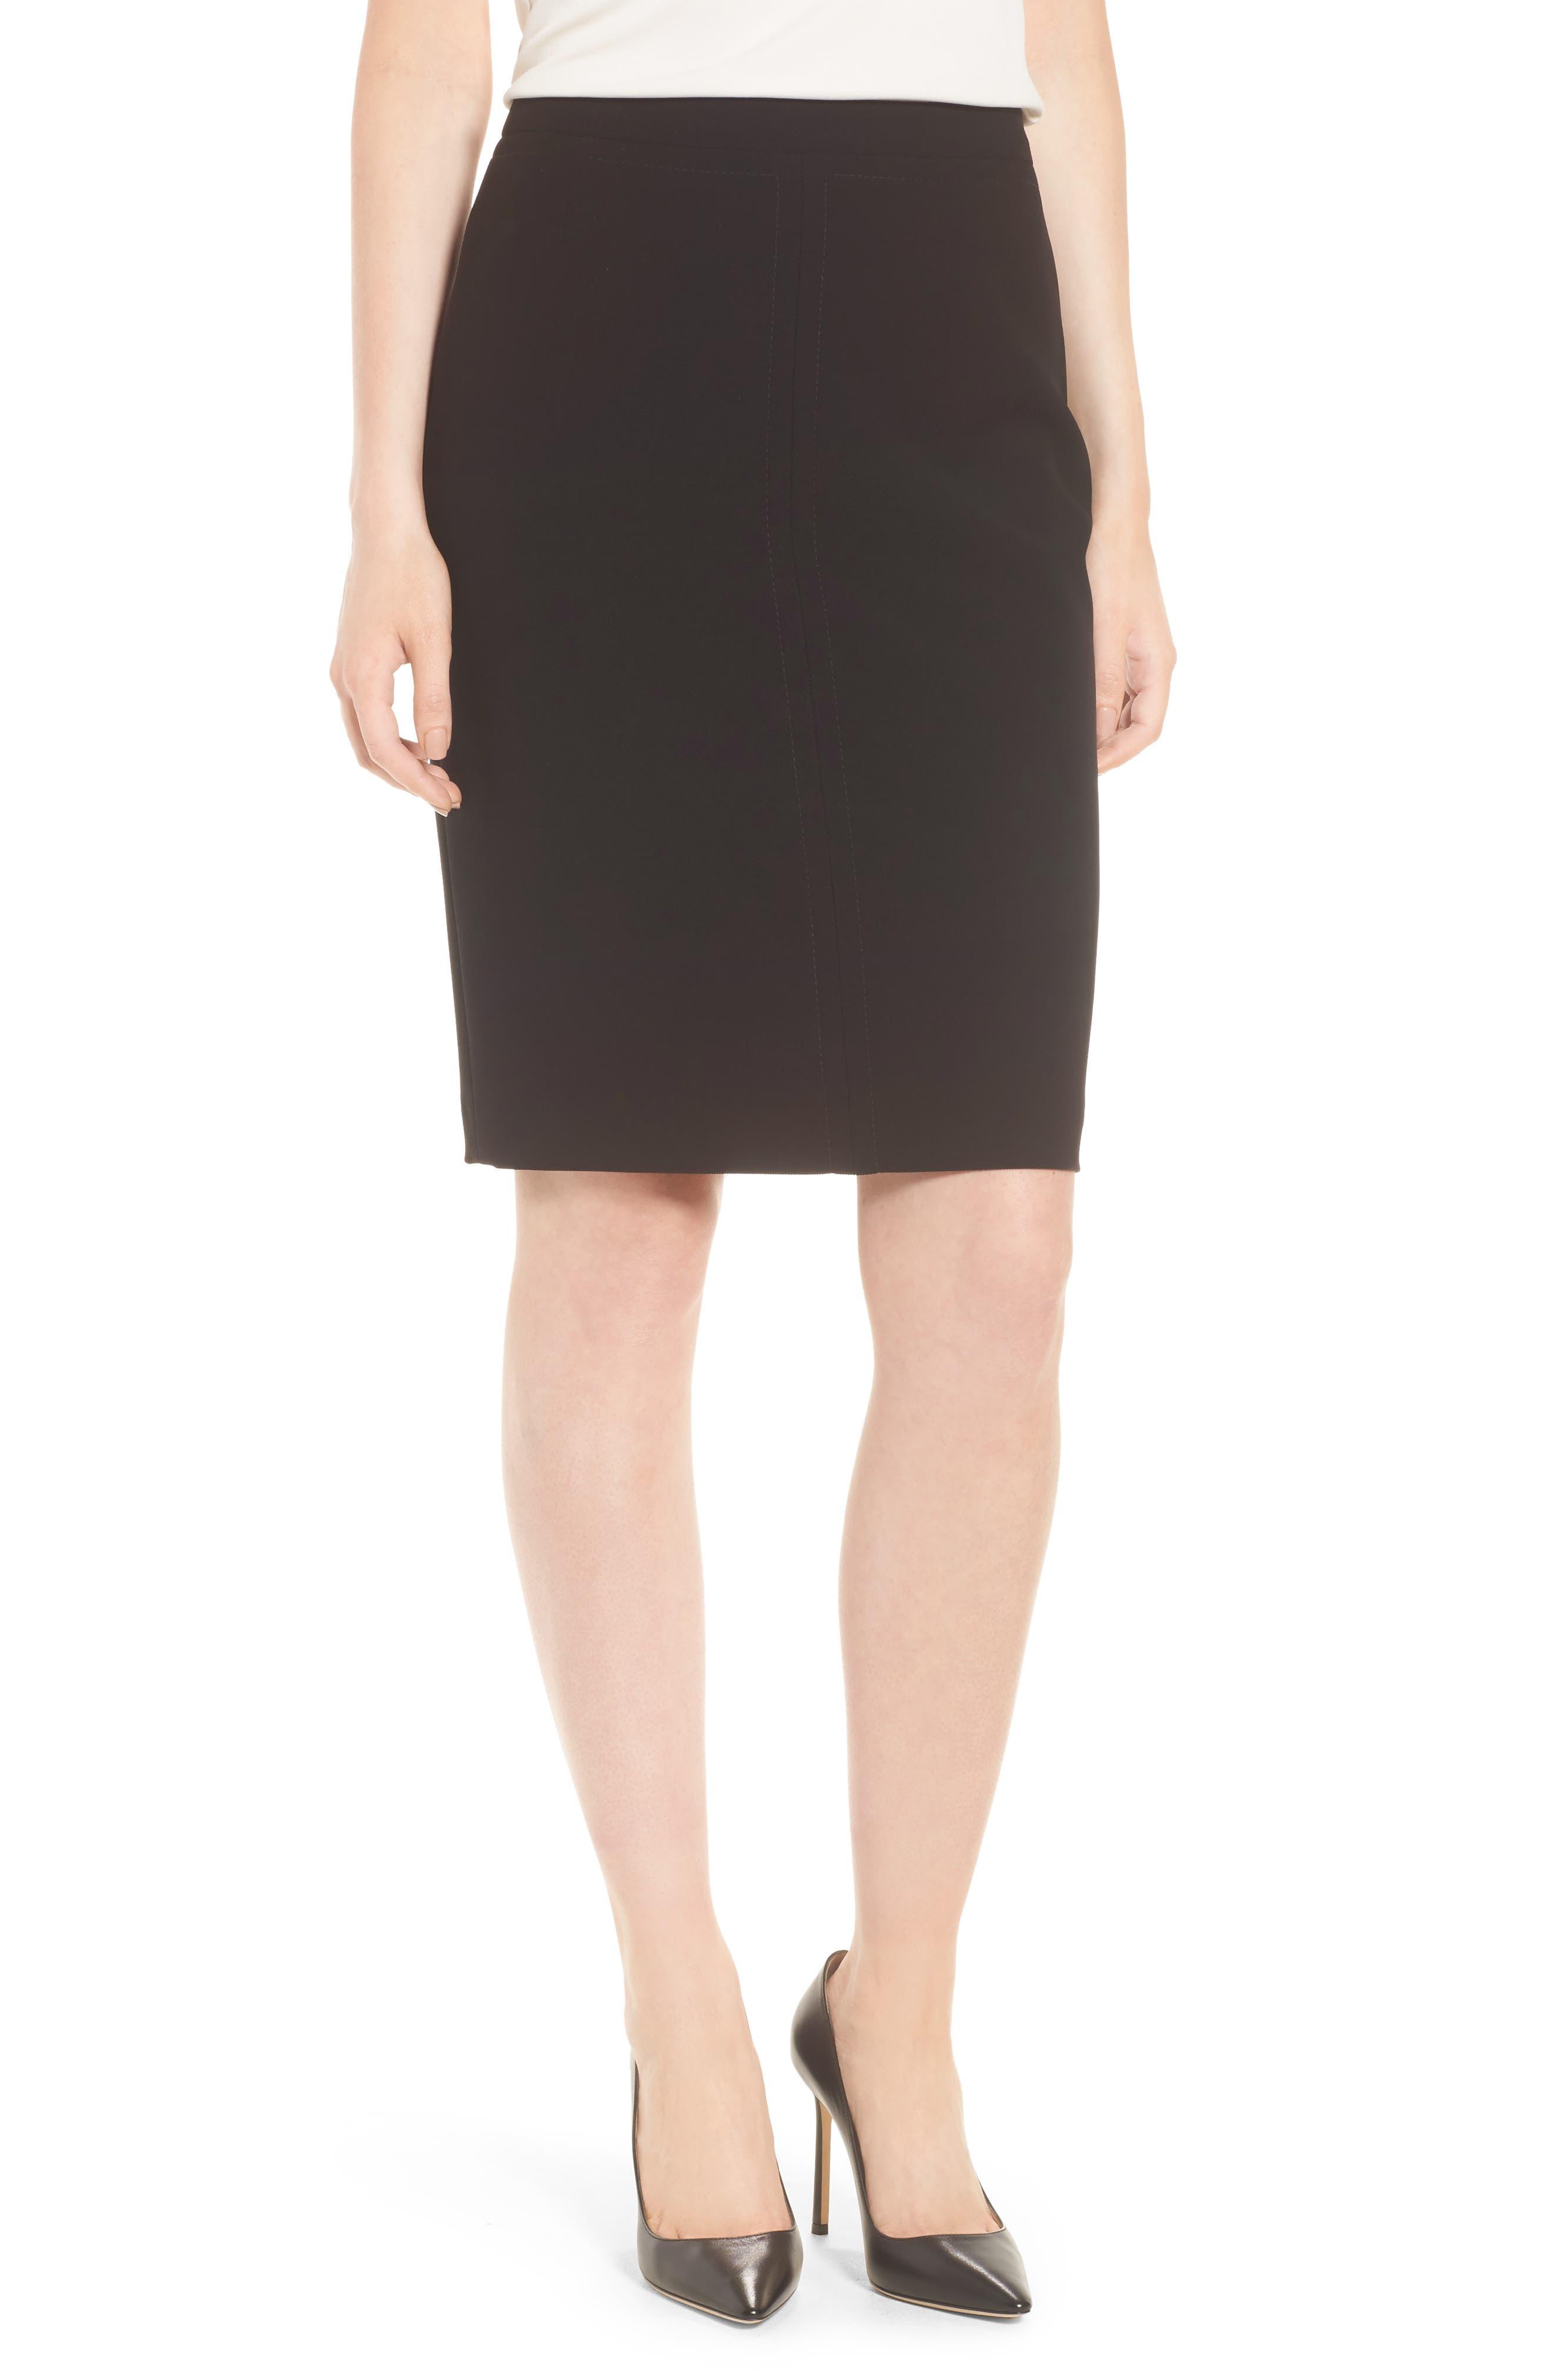 BOSS Vuriona Pencil Skirt, Main, color, 001